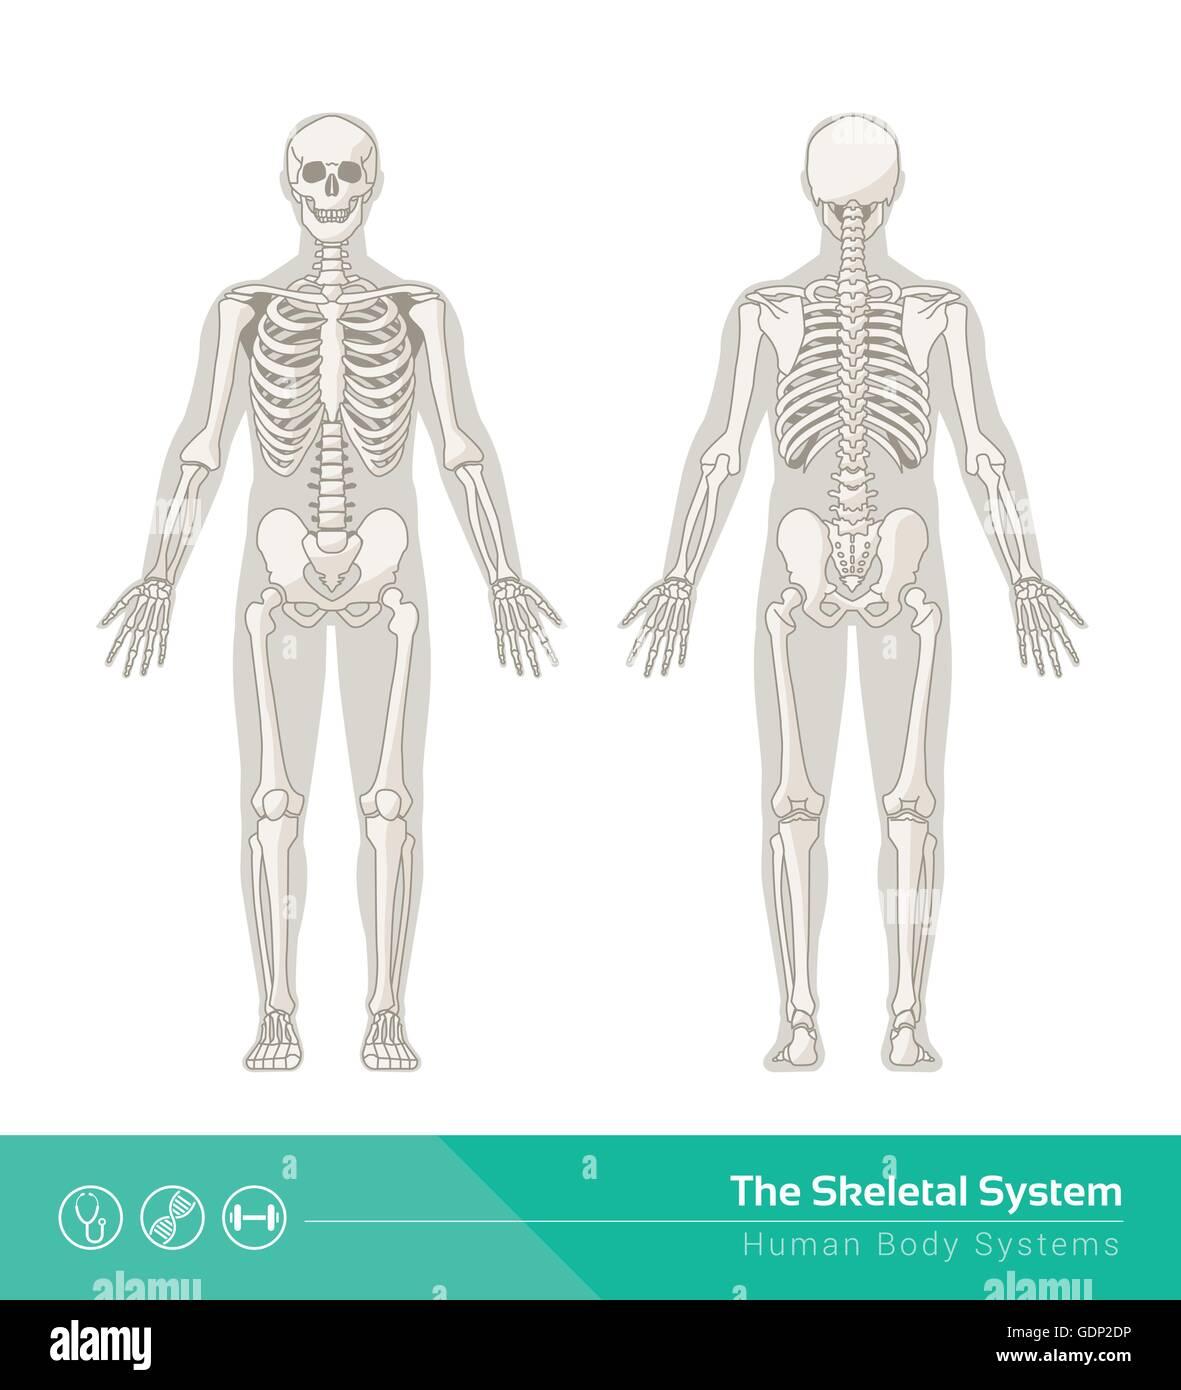 Human Skeletal System Stock Photos Human Skeletal System Stock